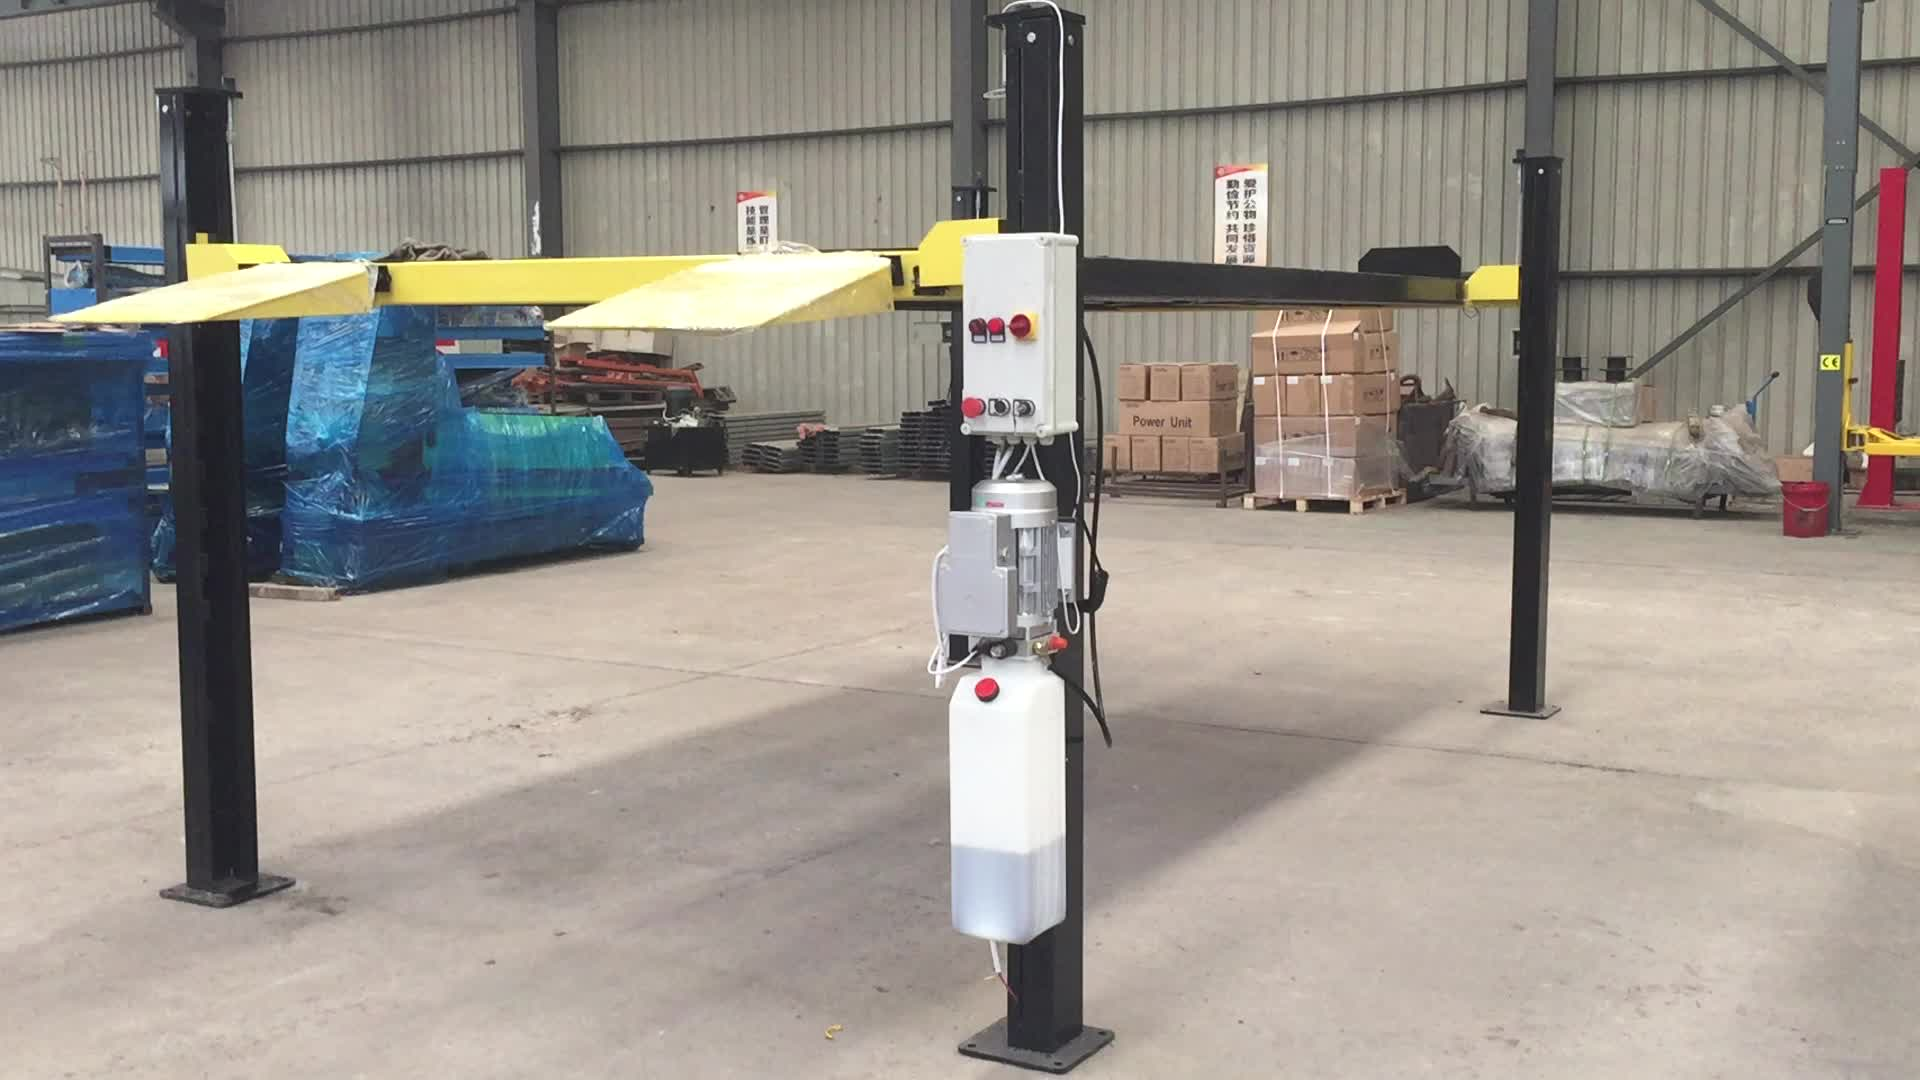 mobile underground mechanical garage used 4 post car parking lift